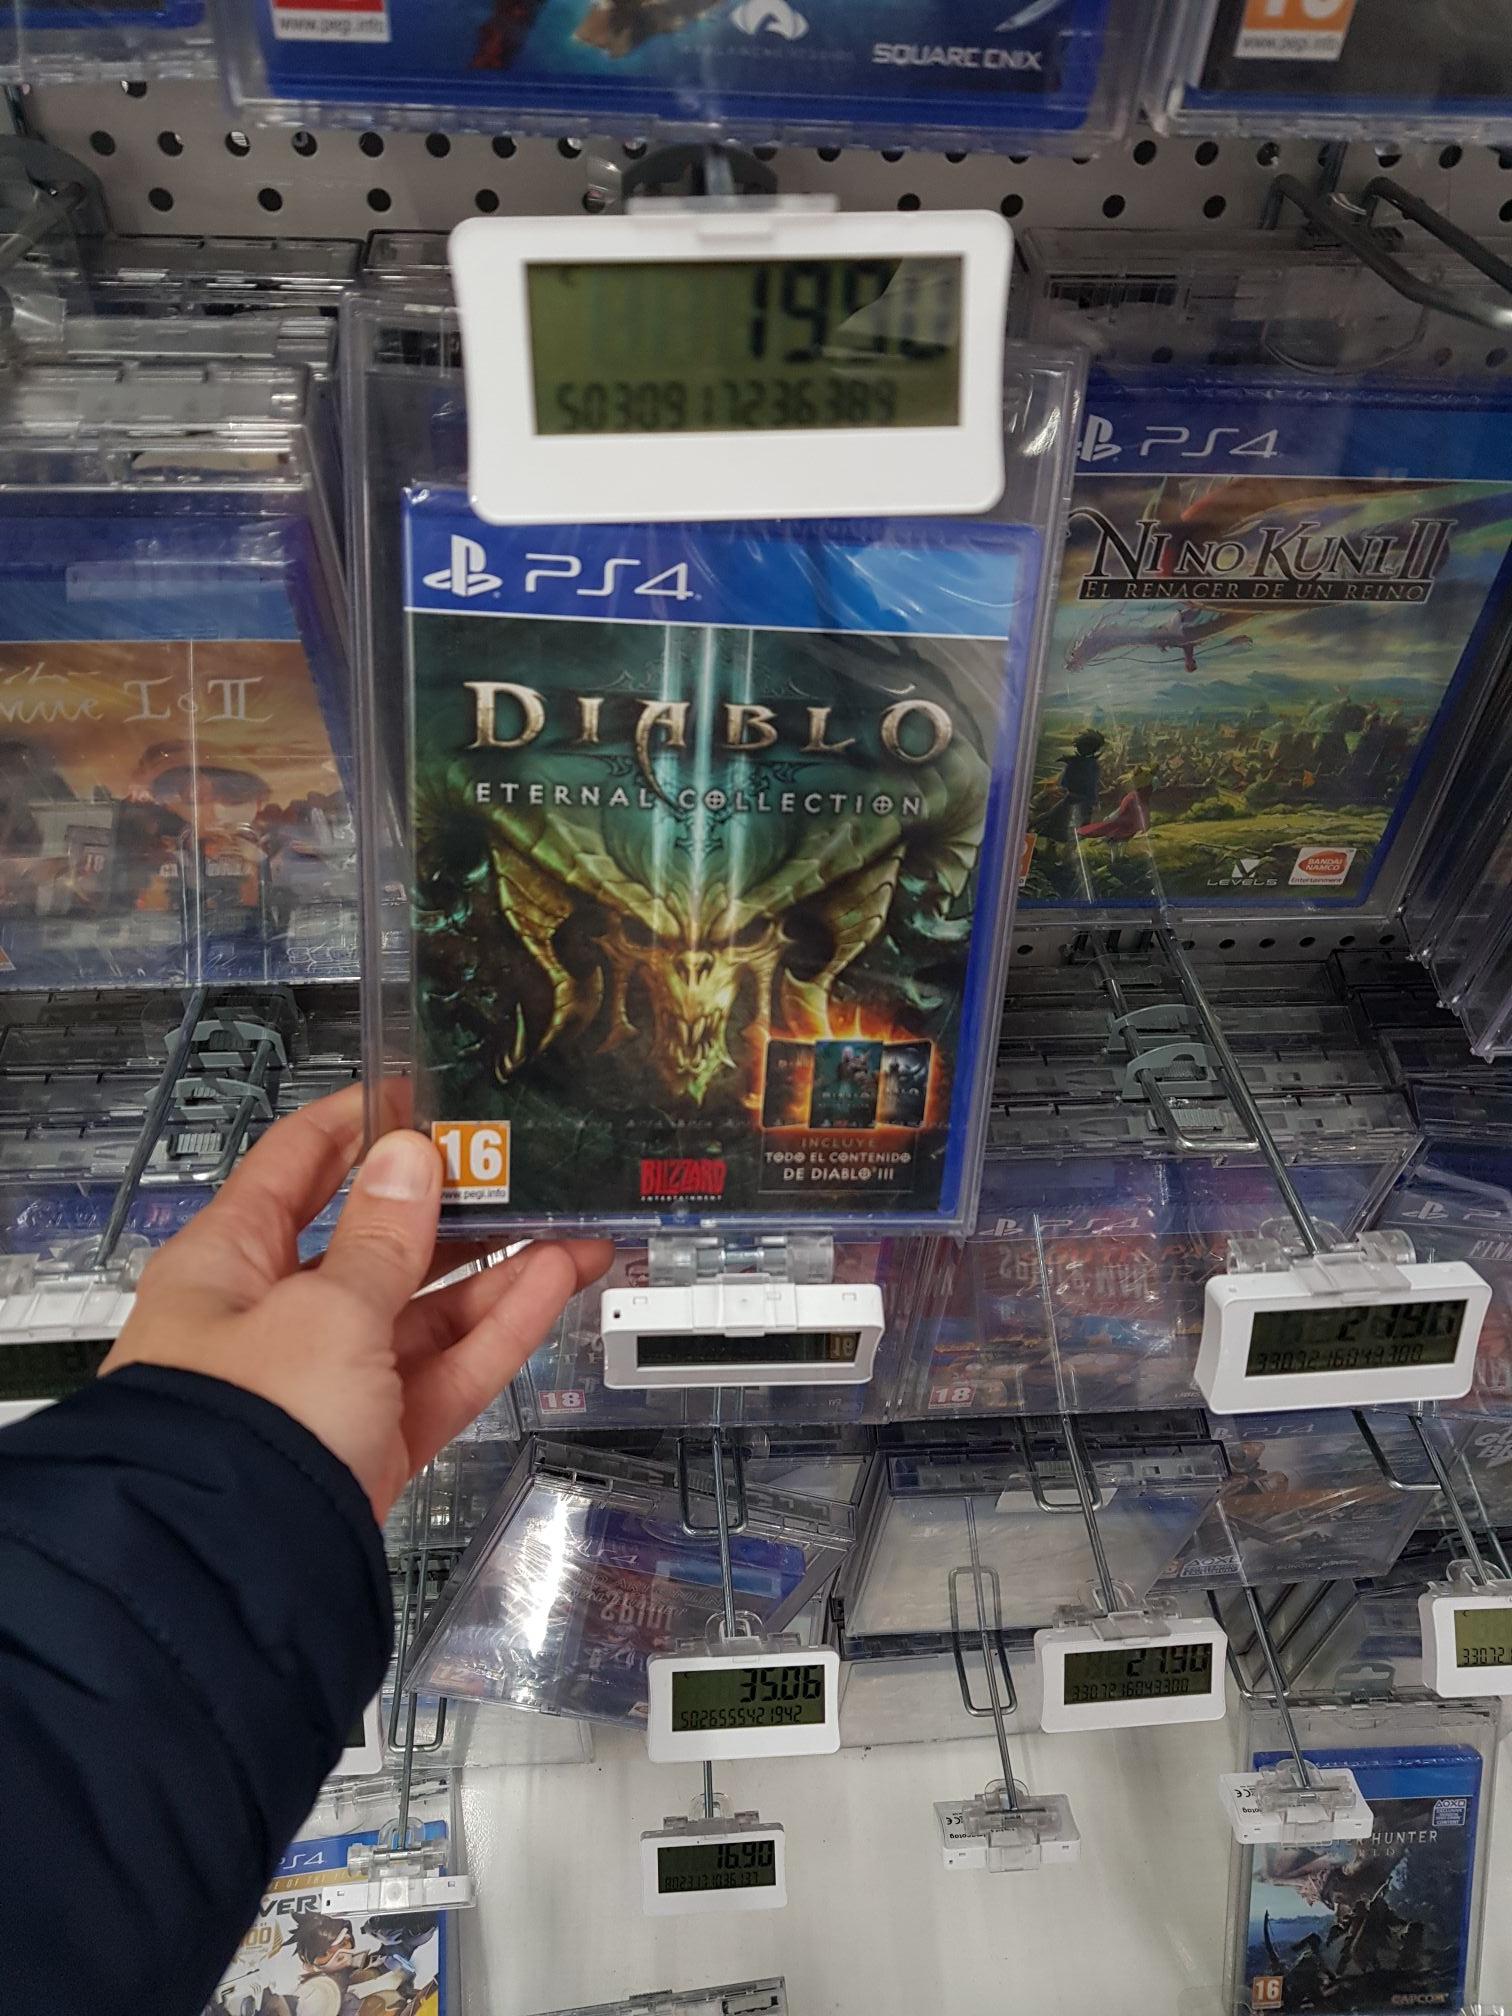 Diablo III Eternal Collection (Mediamarkt de Goya en Madrid)